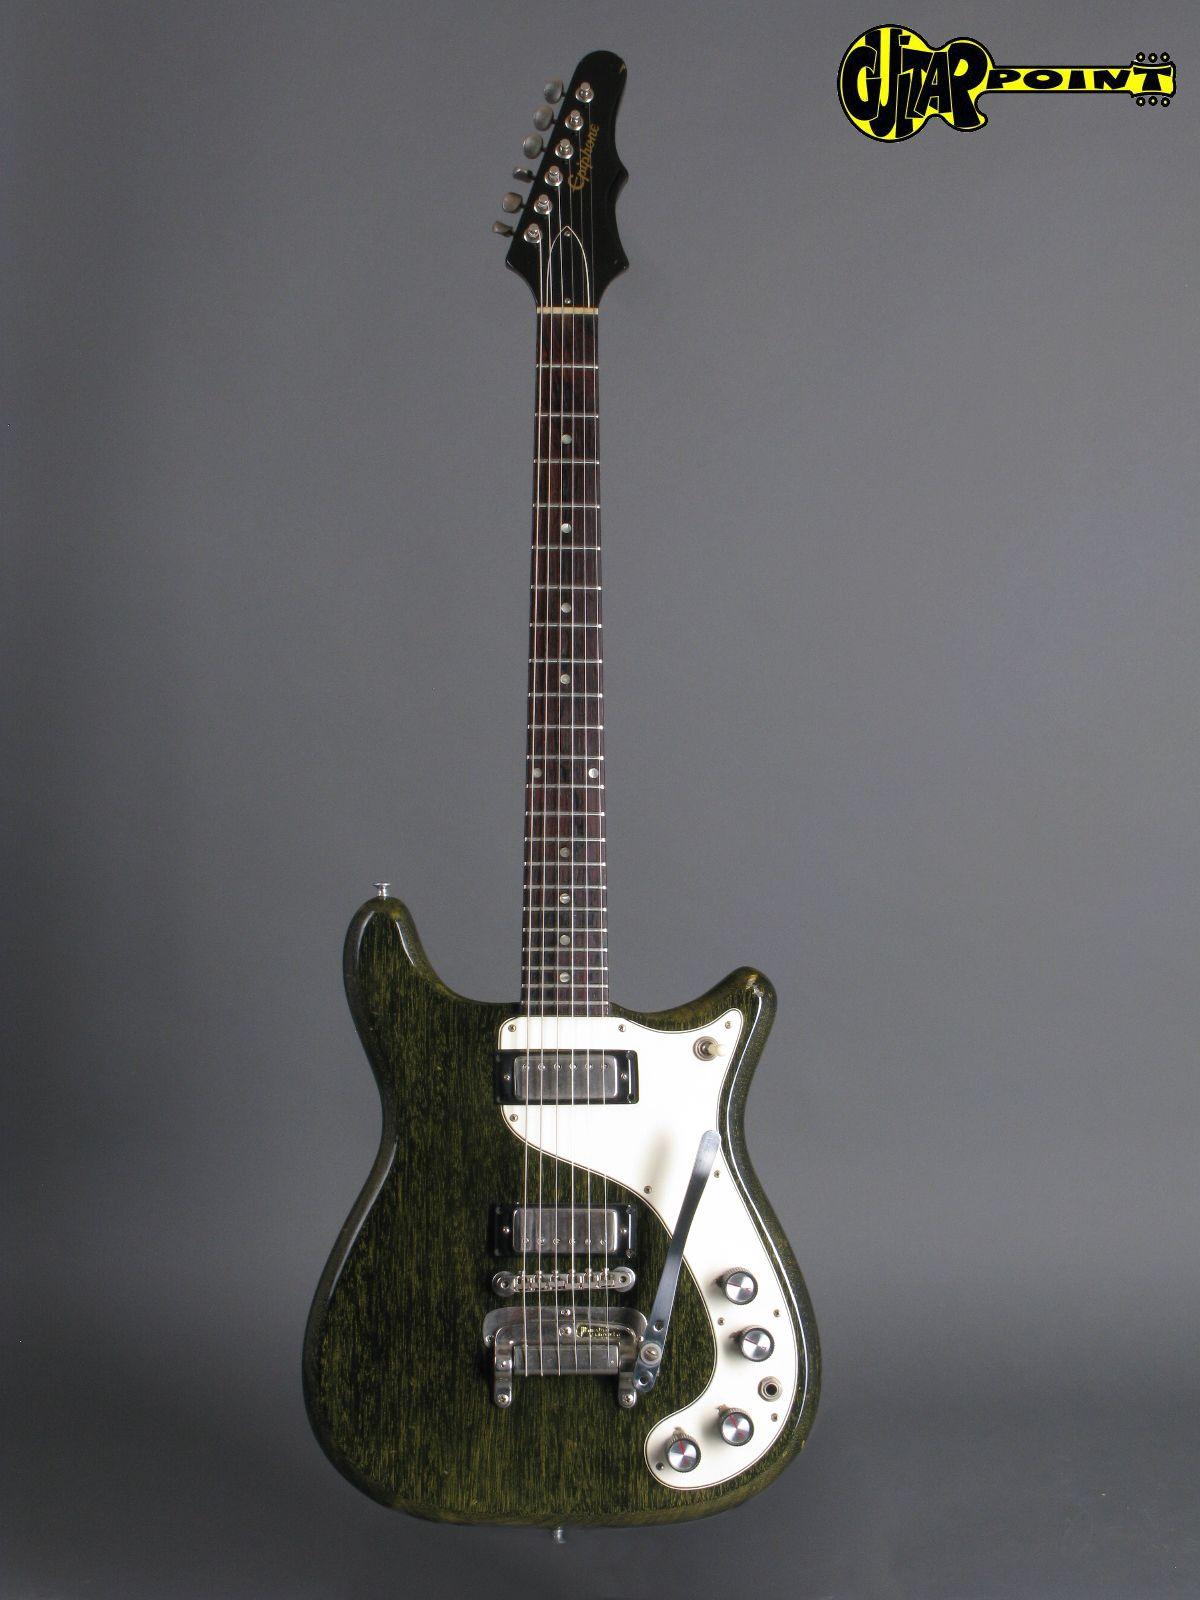 C Fox Guitar For Sale Epiphone Wilshire 1965...